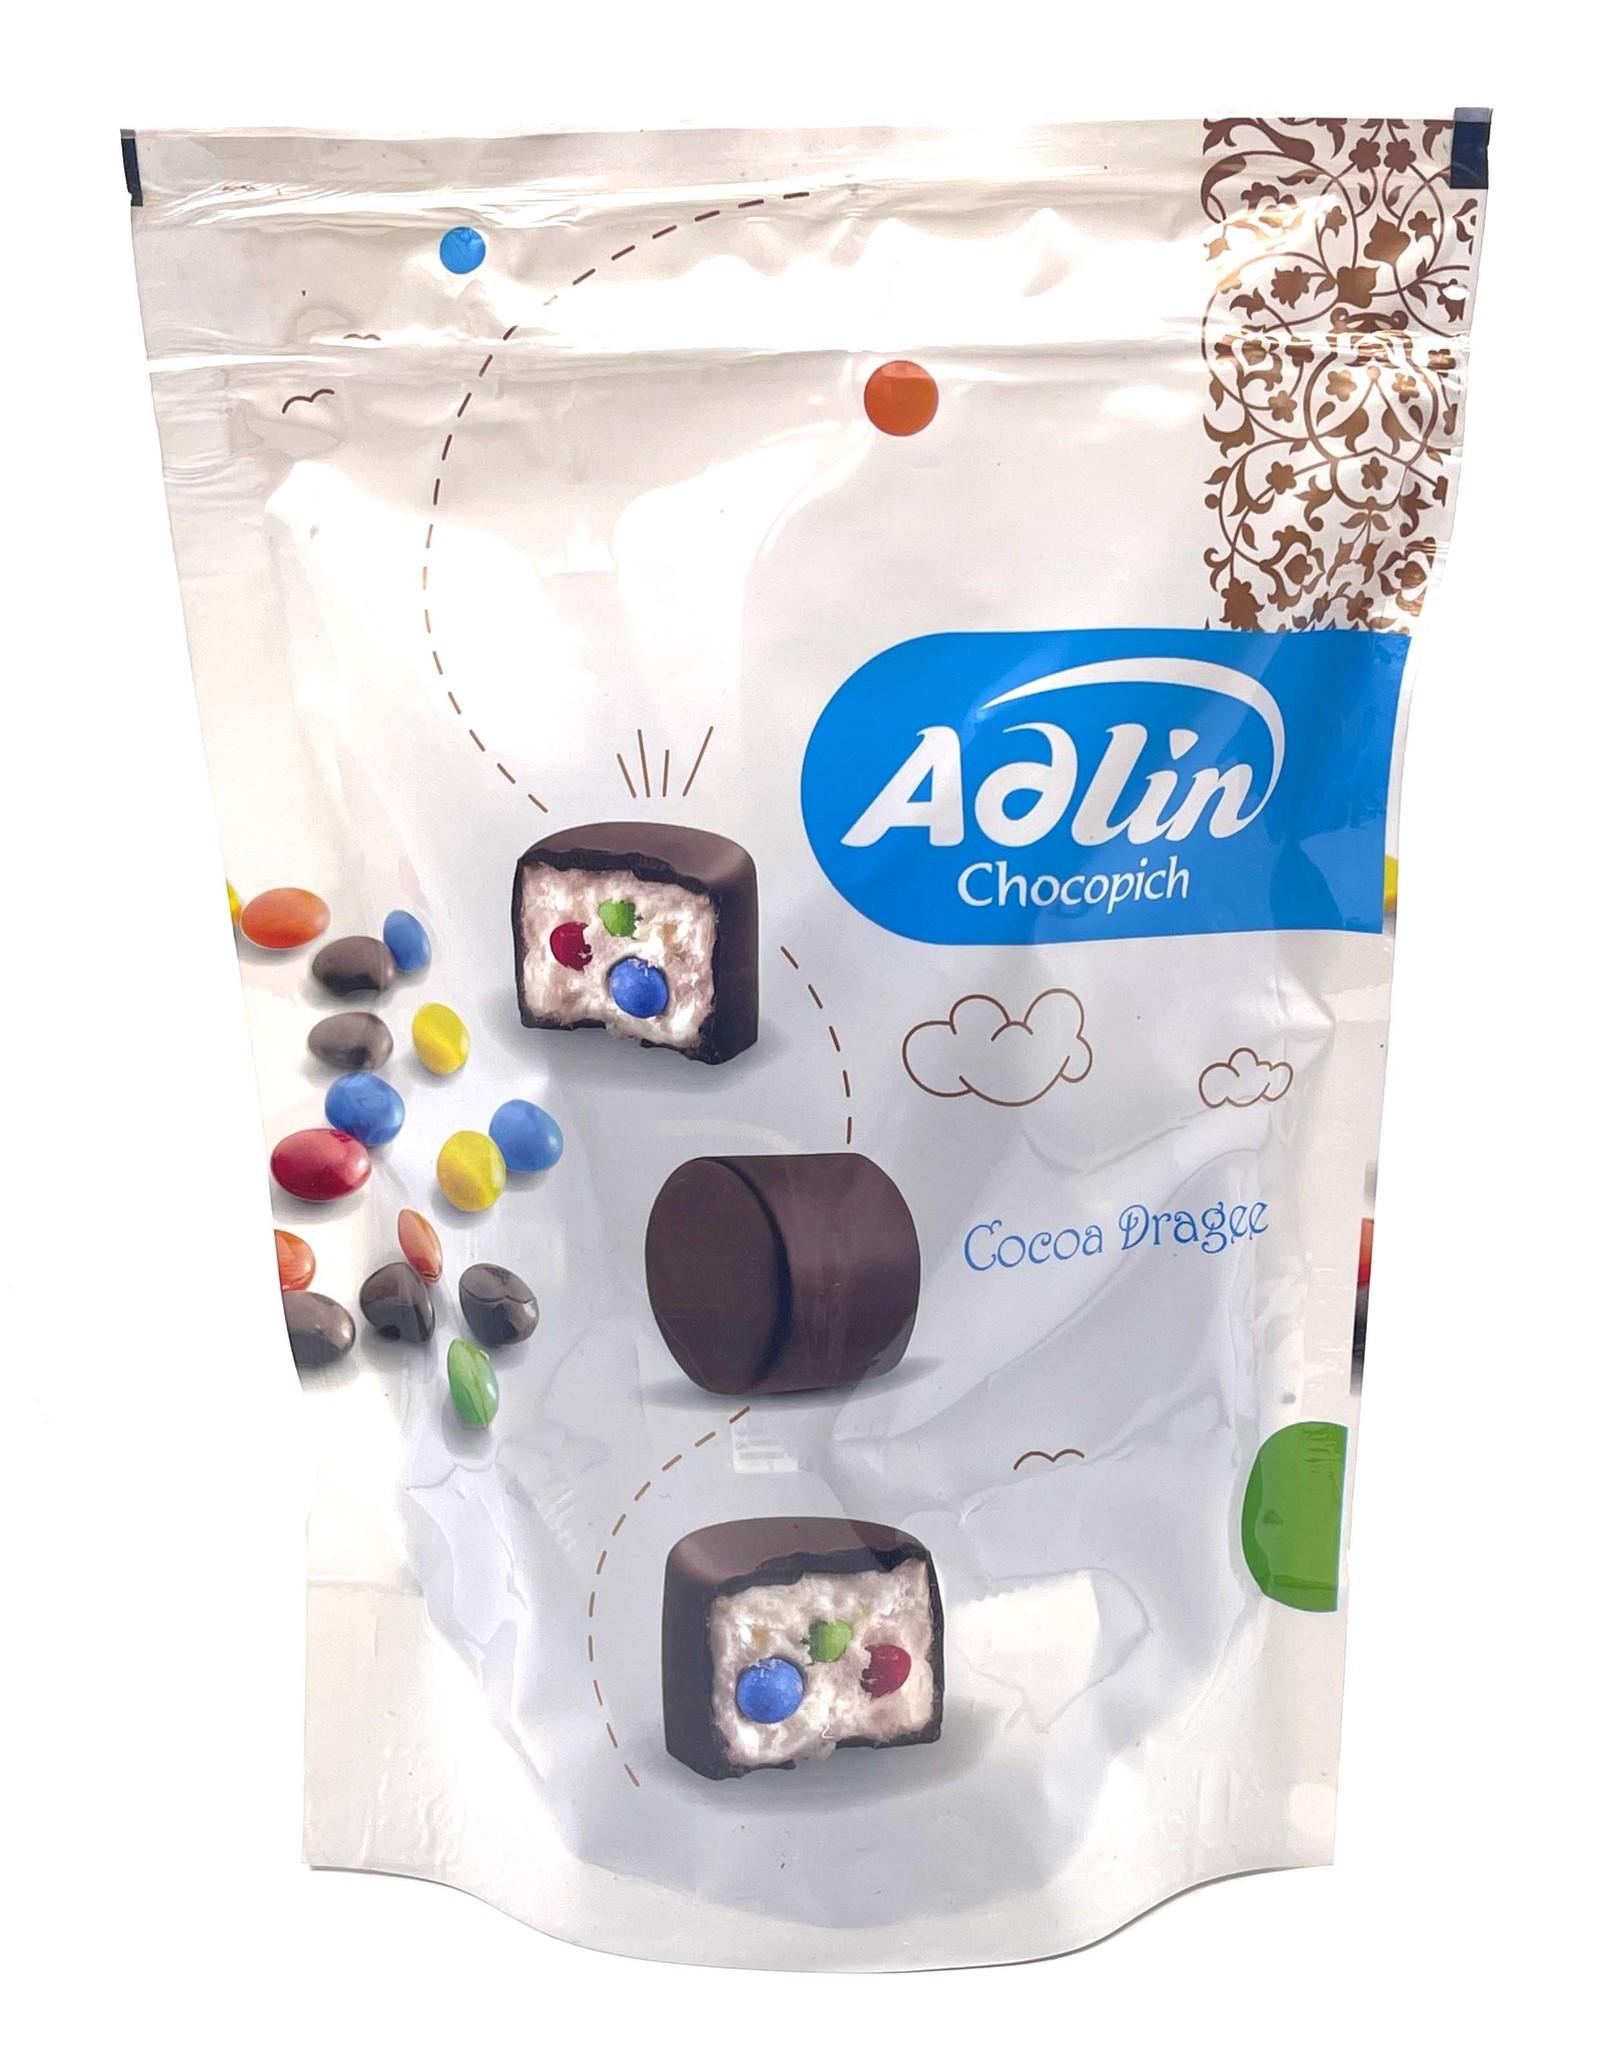 Adlin Пишмание со вкусом ванили с драже в шоколадной глазури, Adlin, 350 г import_files_f2_f28c3759120b11ecaa02484d7ecee297_f46e20e1120811ecaa02484d7ecee297.jpg